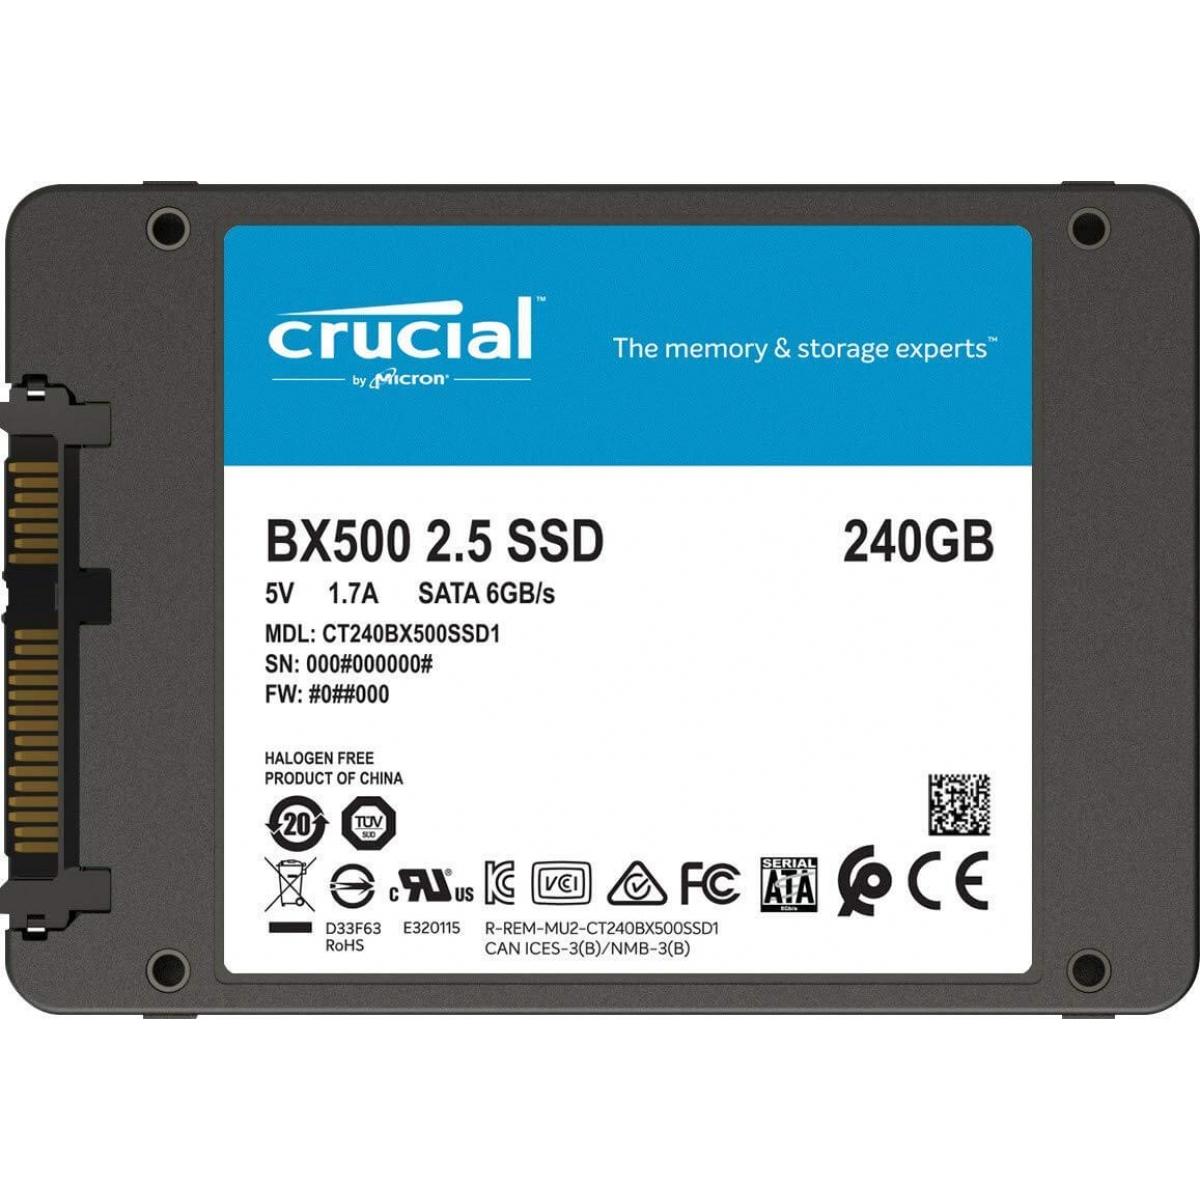 SSD Crucial BX500, 240GB, Sata III, Leitura 540MBs Gravação 500MBs, CT240BX500SSD1